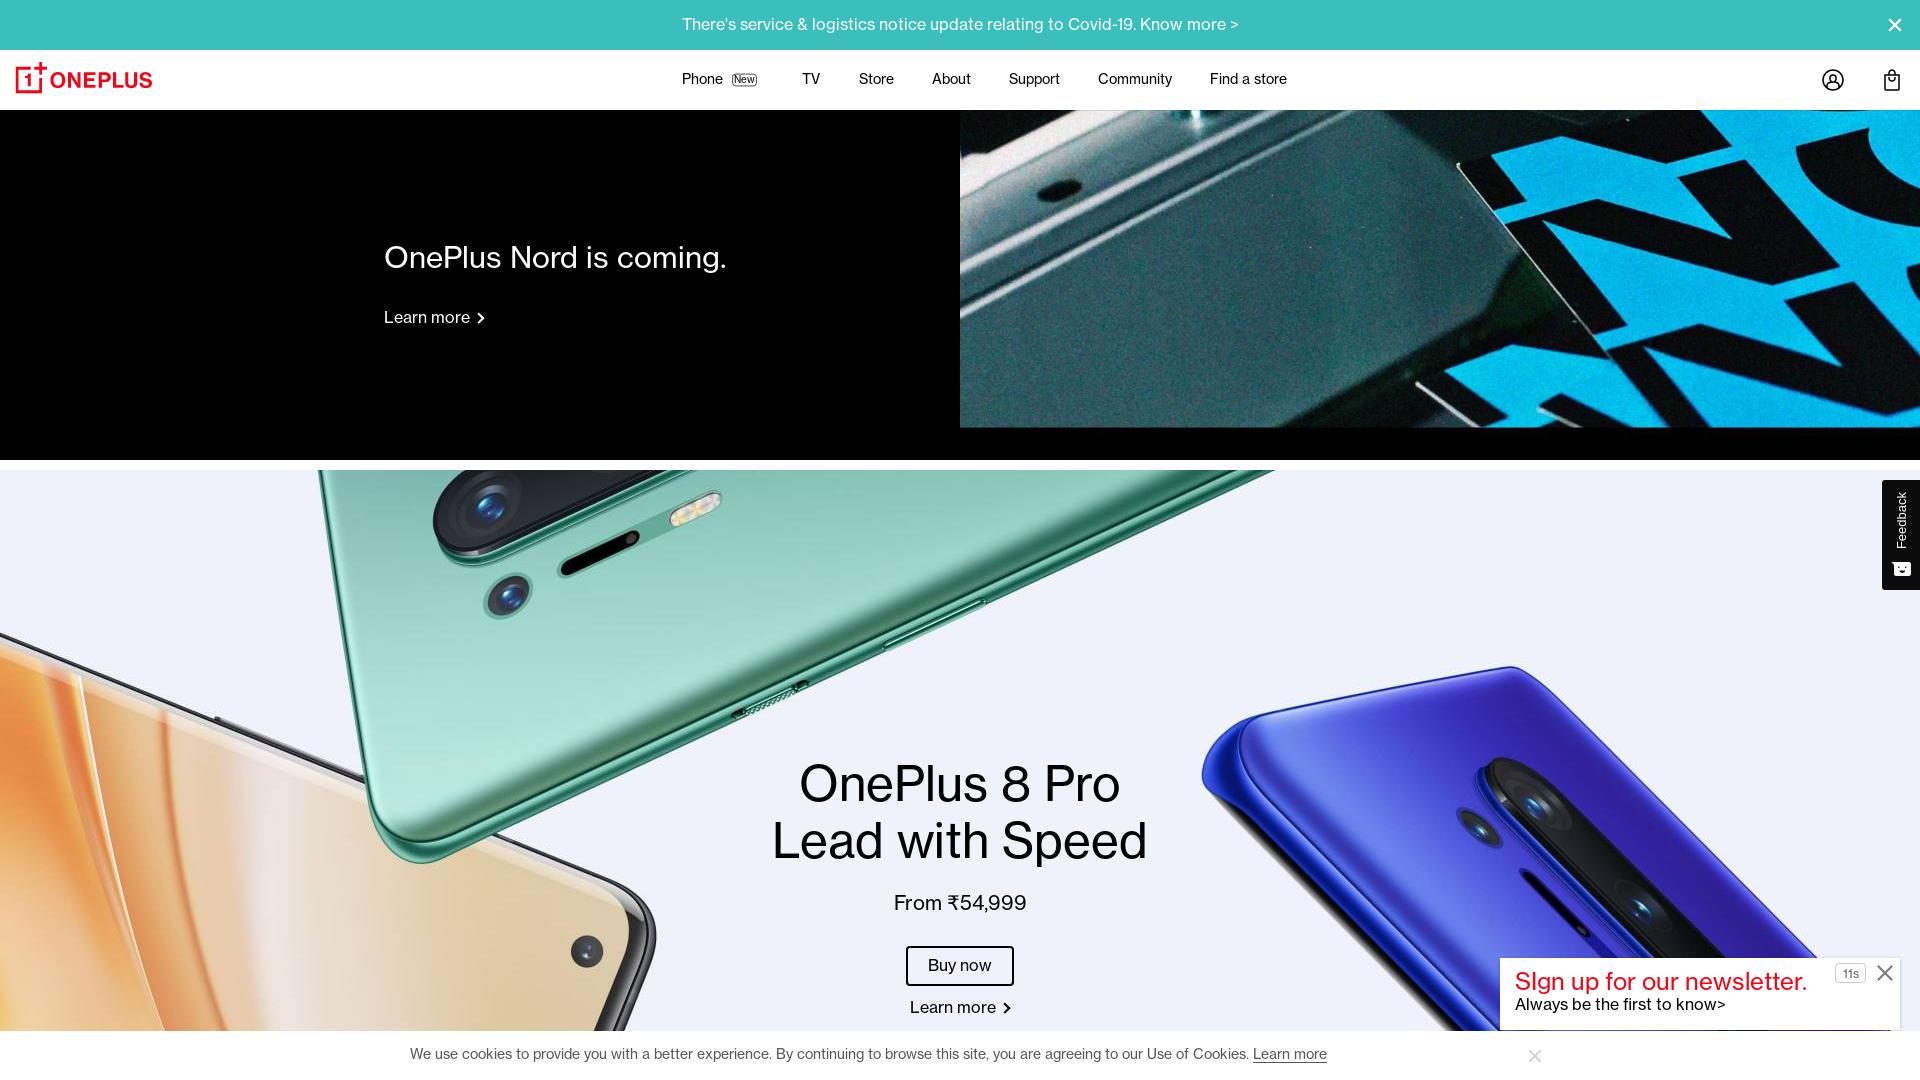 OnePlus [CPS] IN website